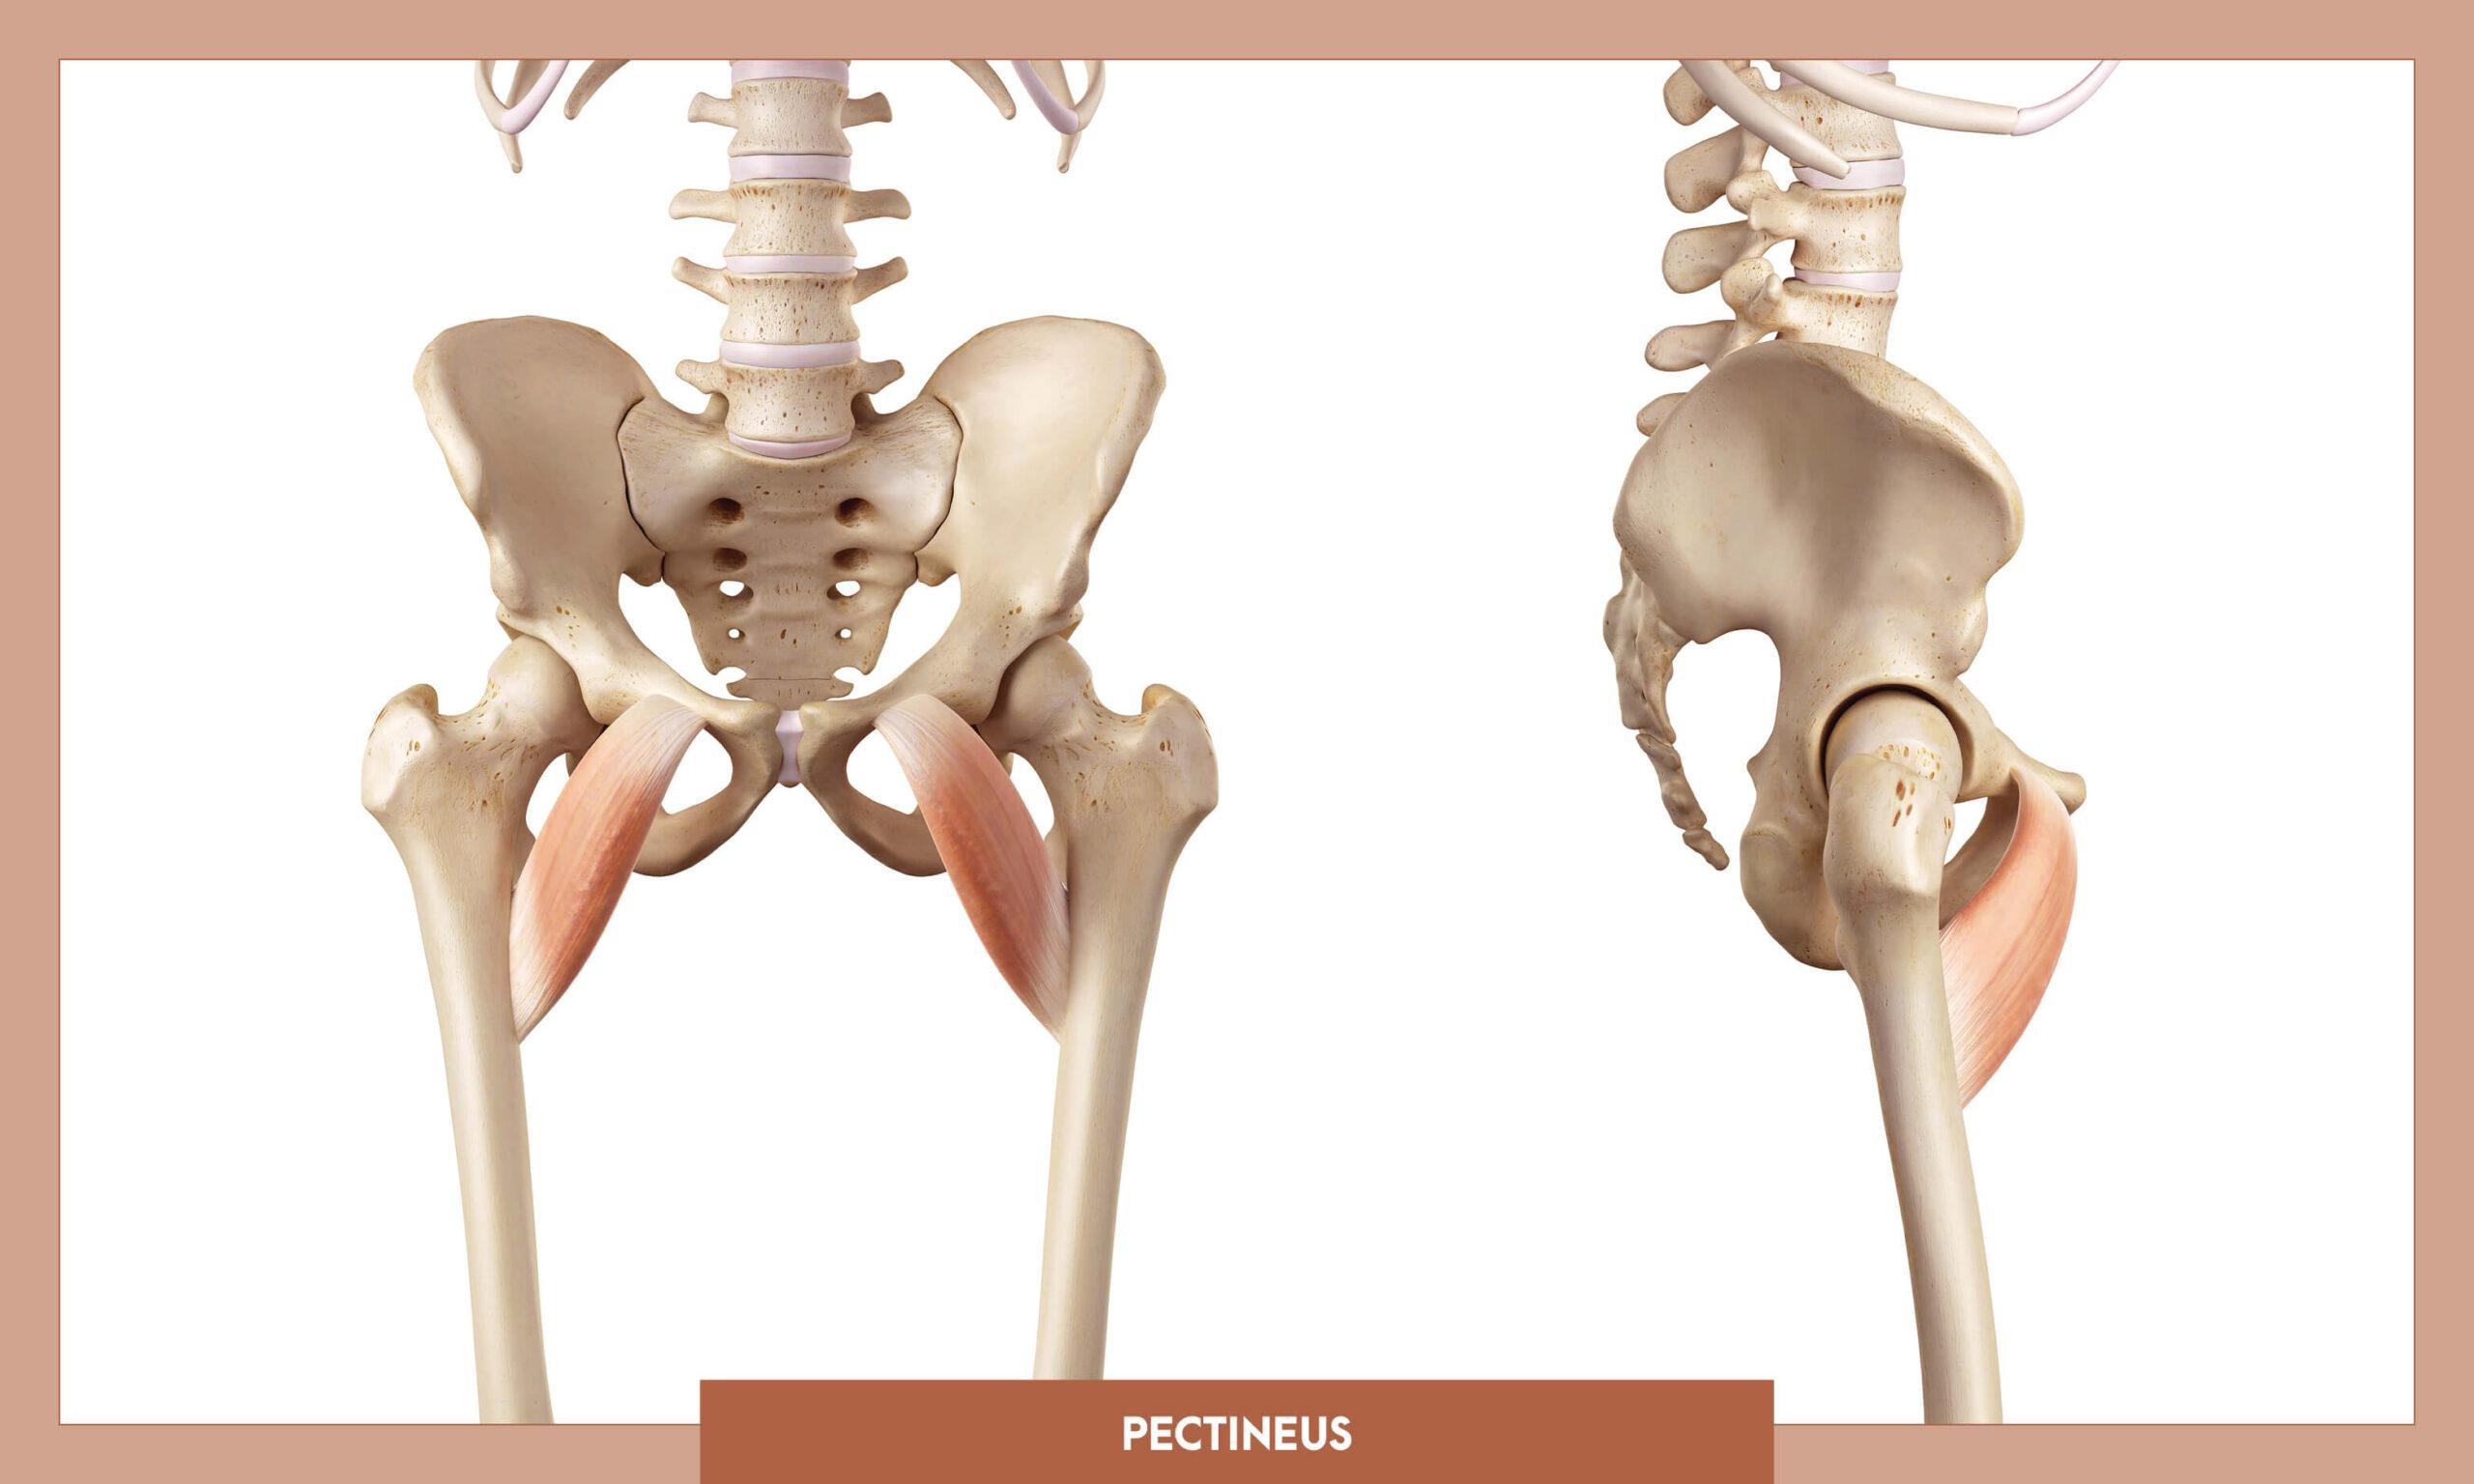 Muscles of thee Lower Limb - Pectineus